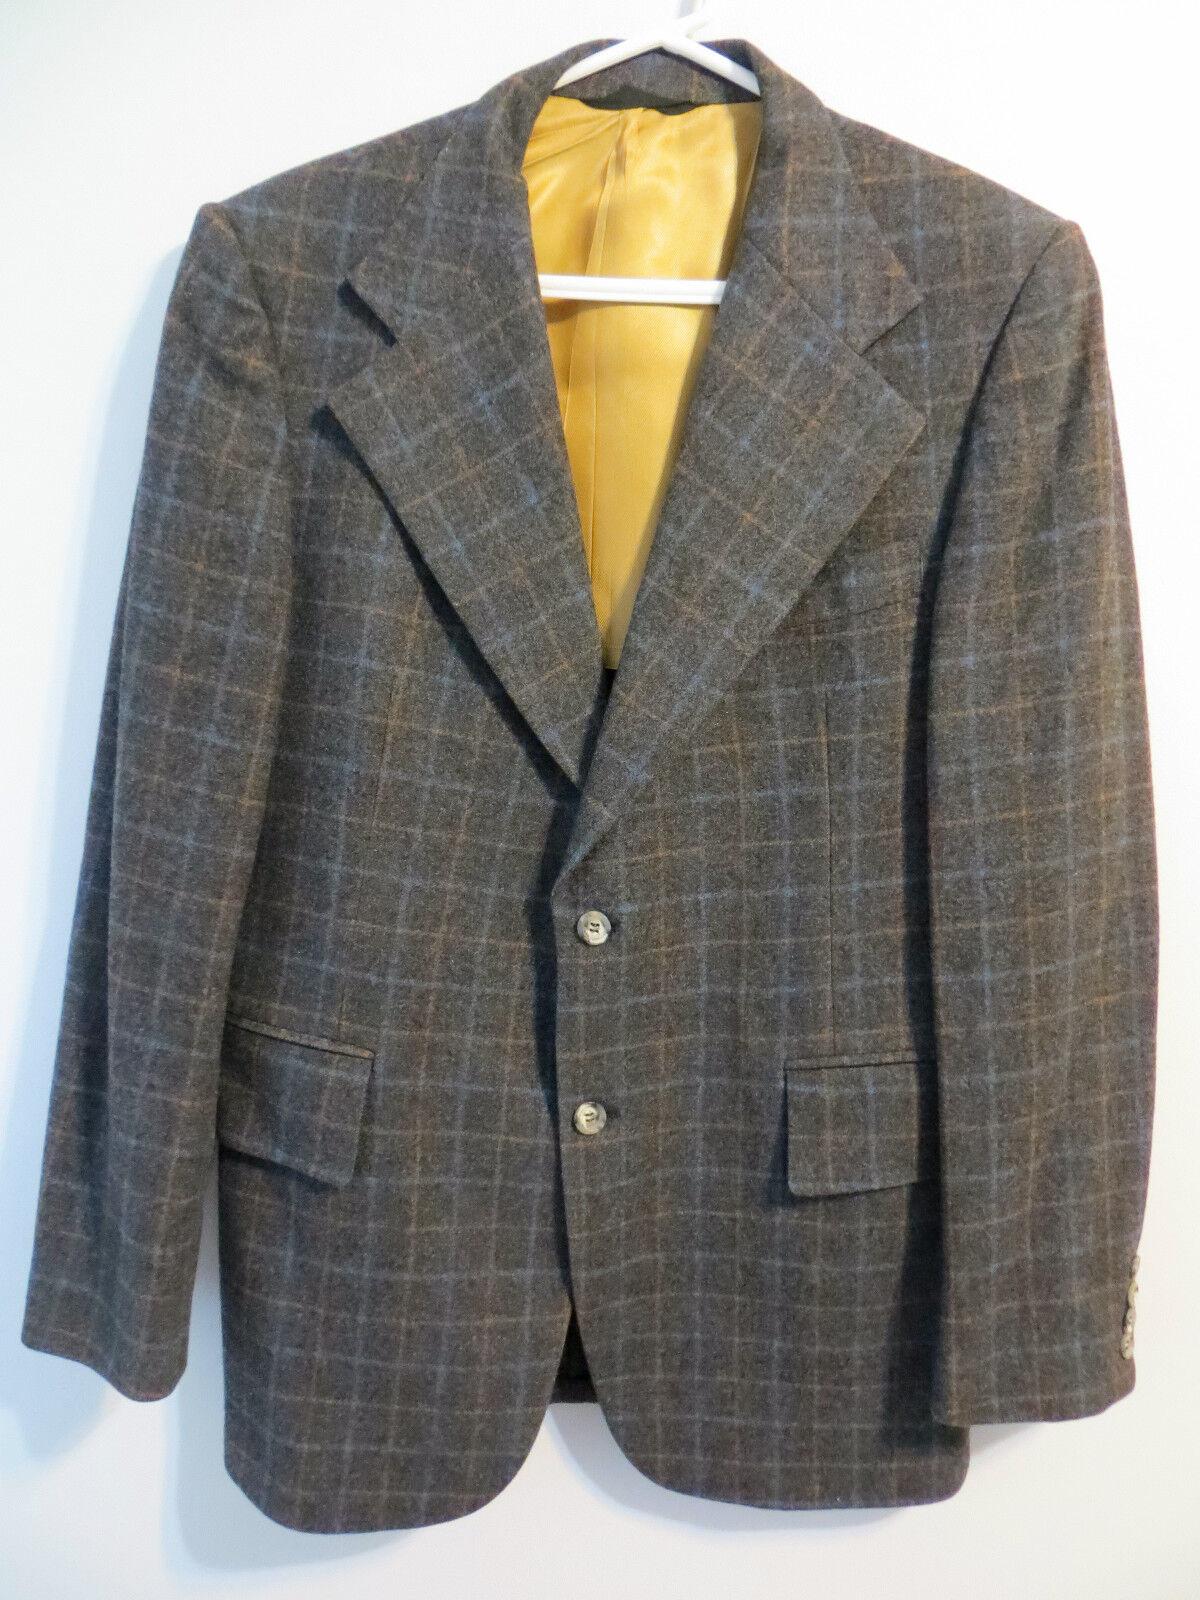 Nino Cerruti Rue Royal Grey Windowpane Mens Wool Suit 40 R Flat Front Pant 34x31